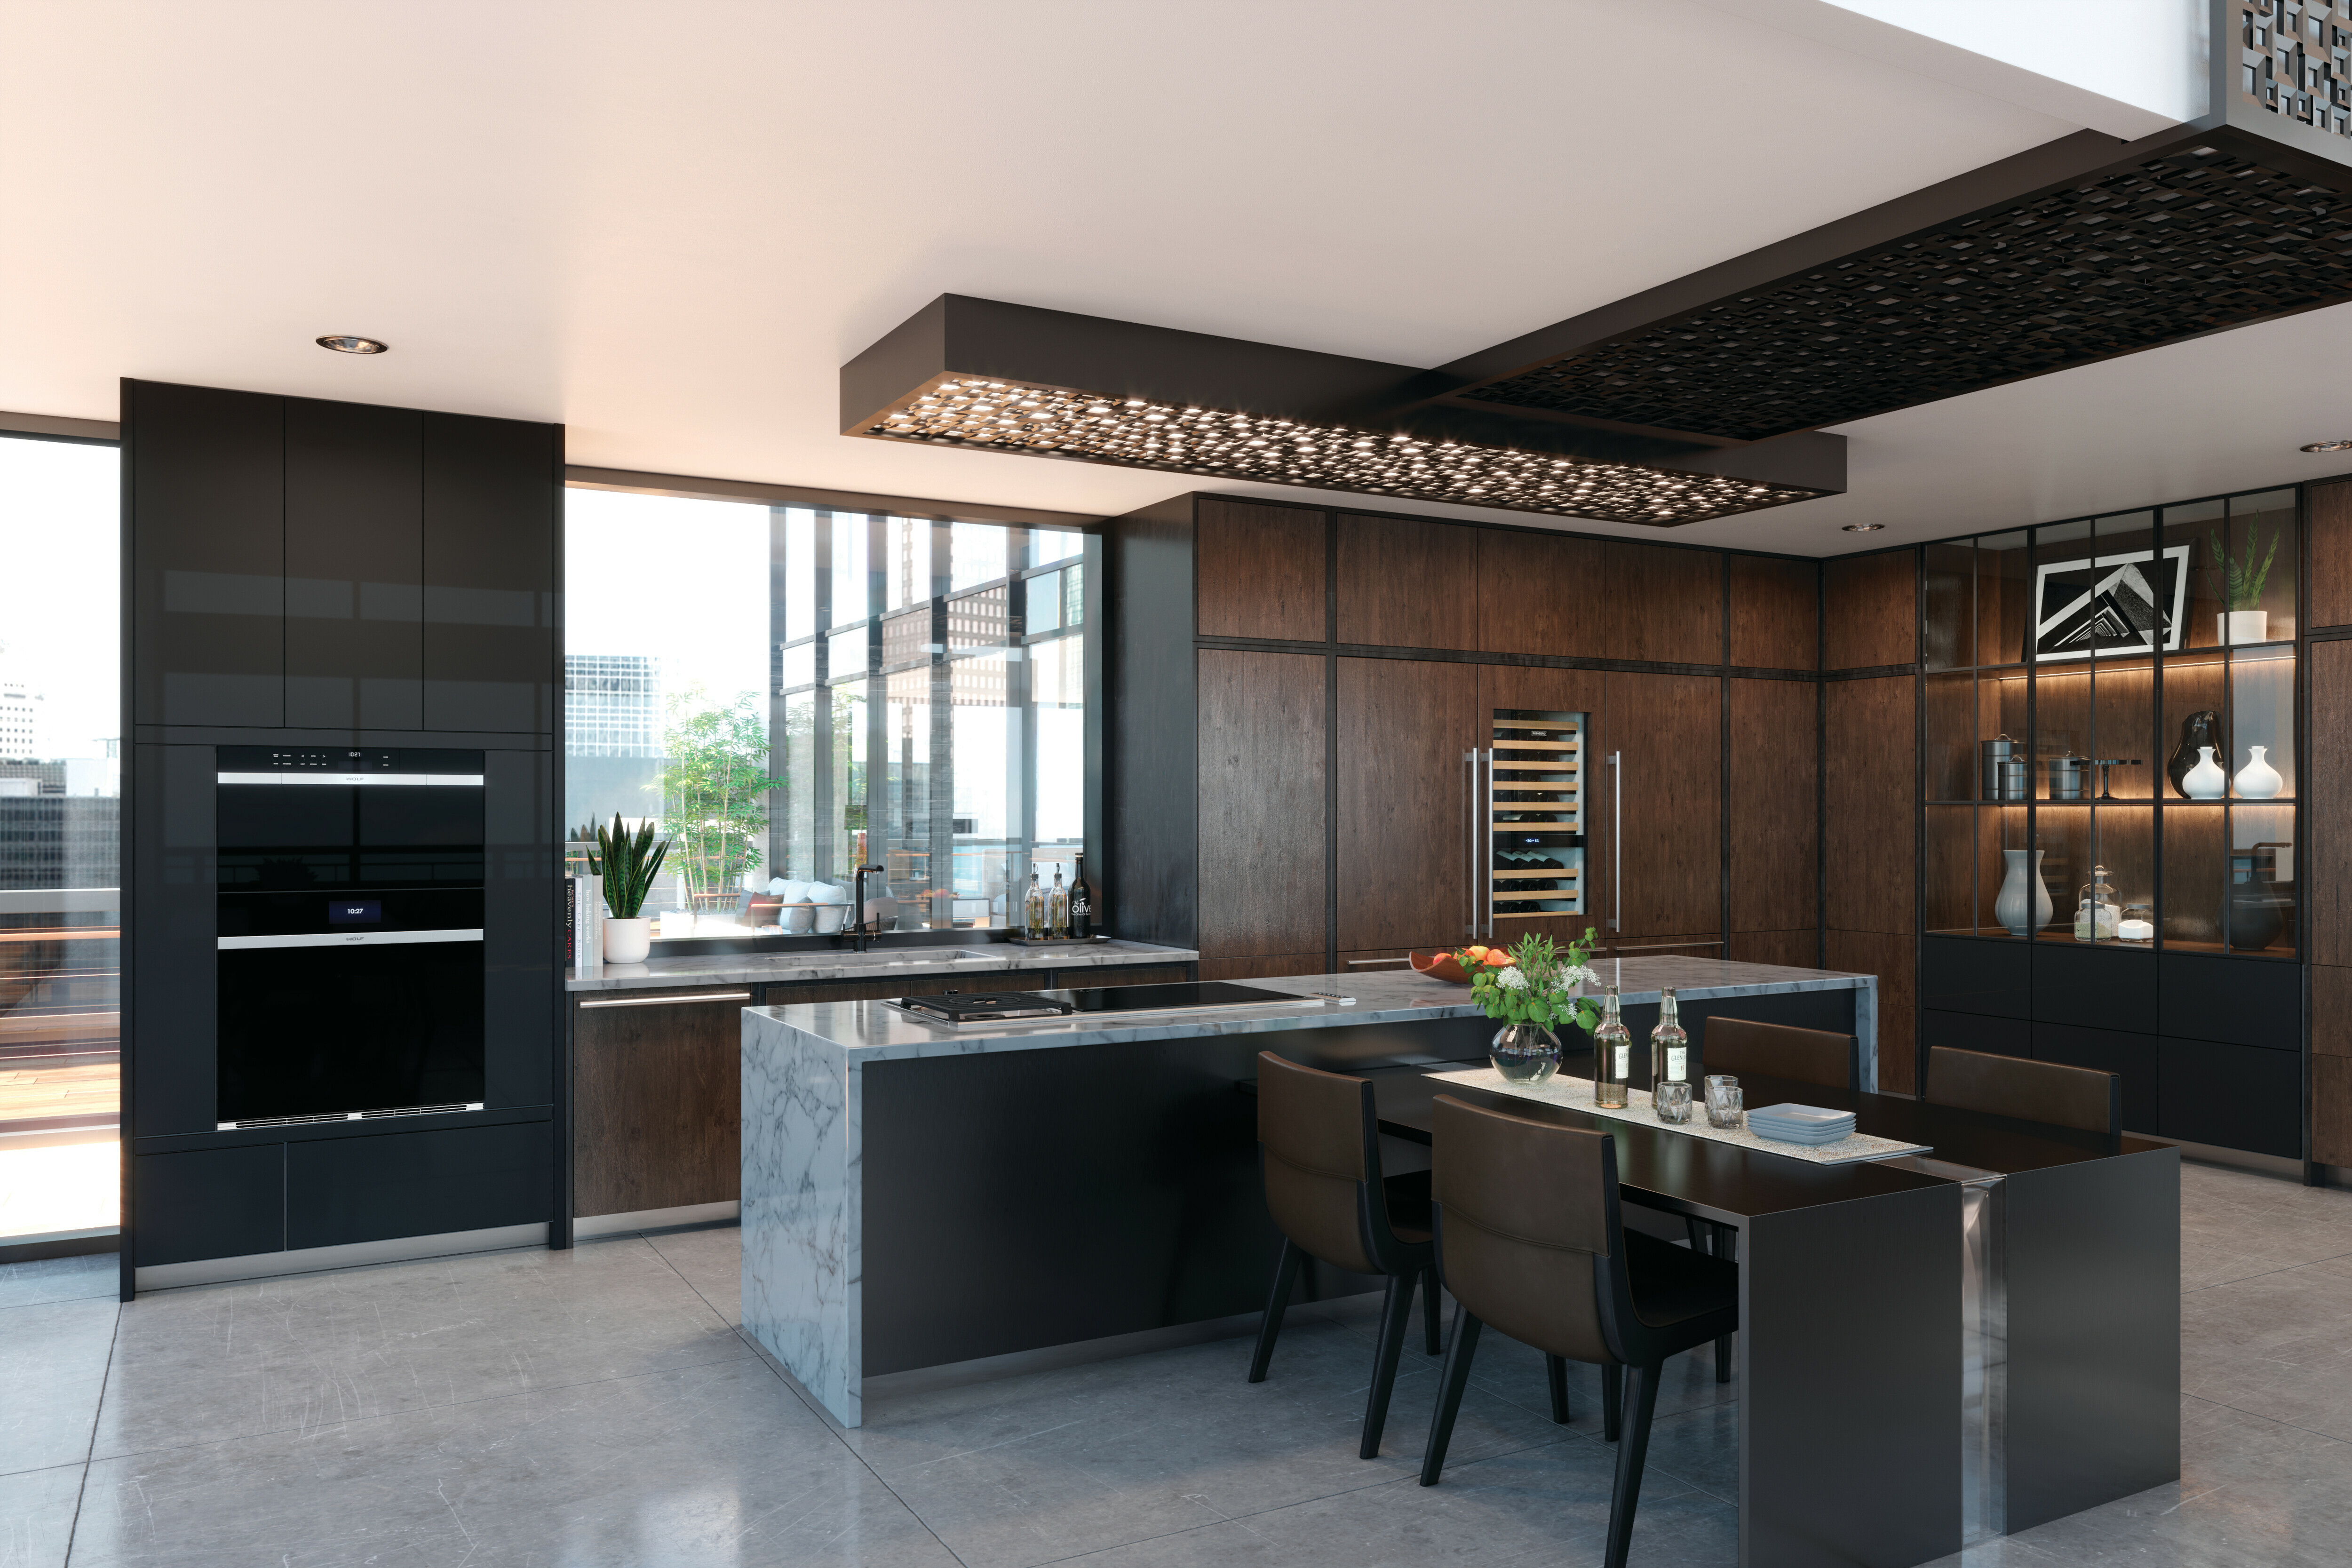 2819 Kitchen1 REV Final CMYK Embedded Medium Resolution